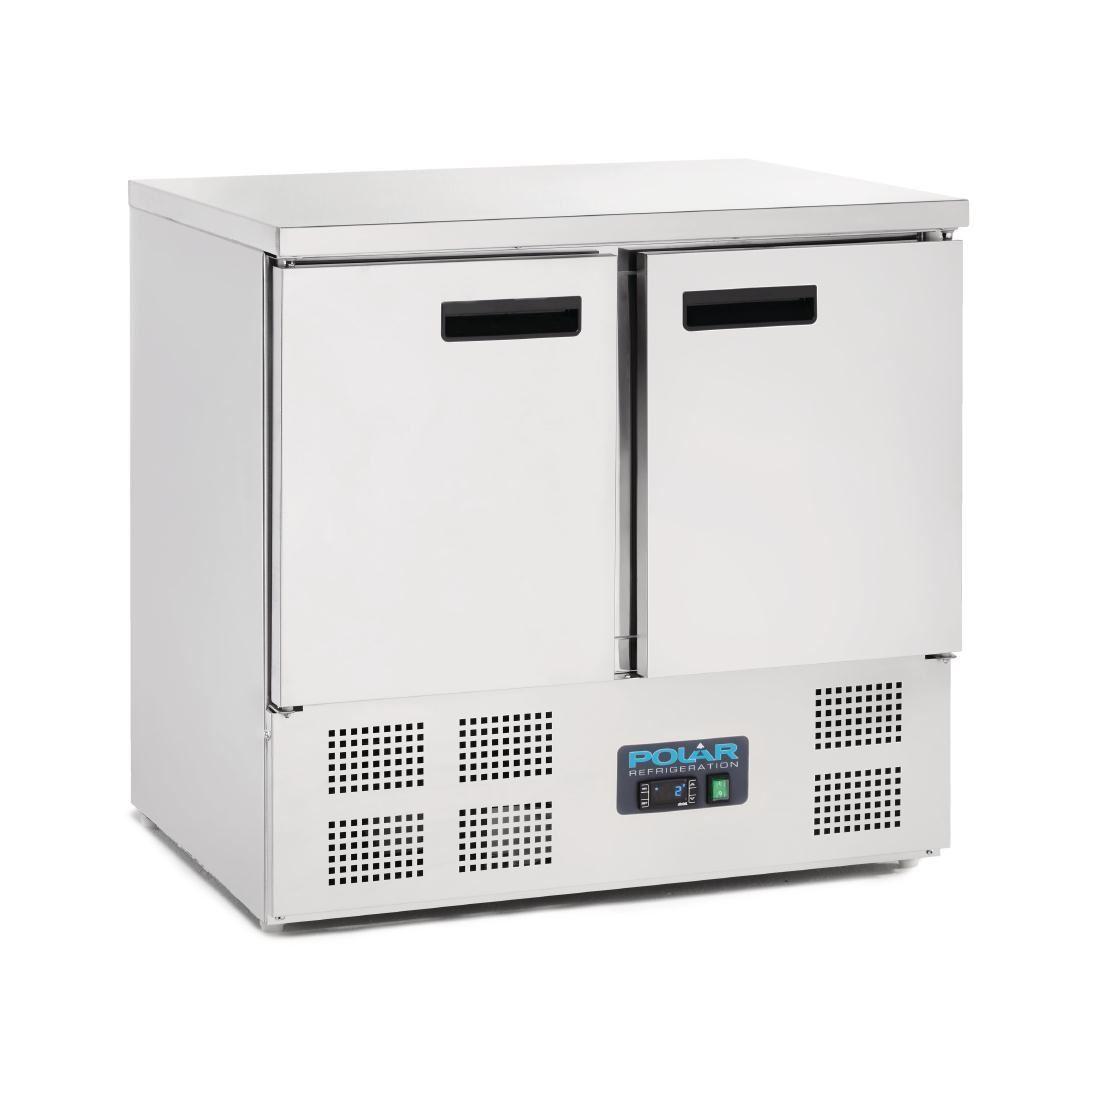 Polar 2 Door Compact Counter Fridge 240 Litre Commercial Kitchen  Refrigerator ...